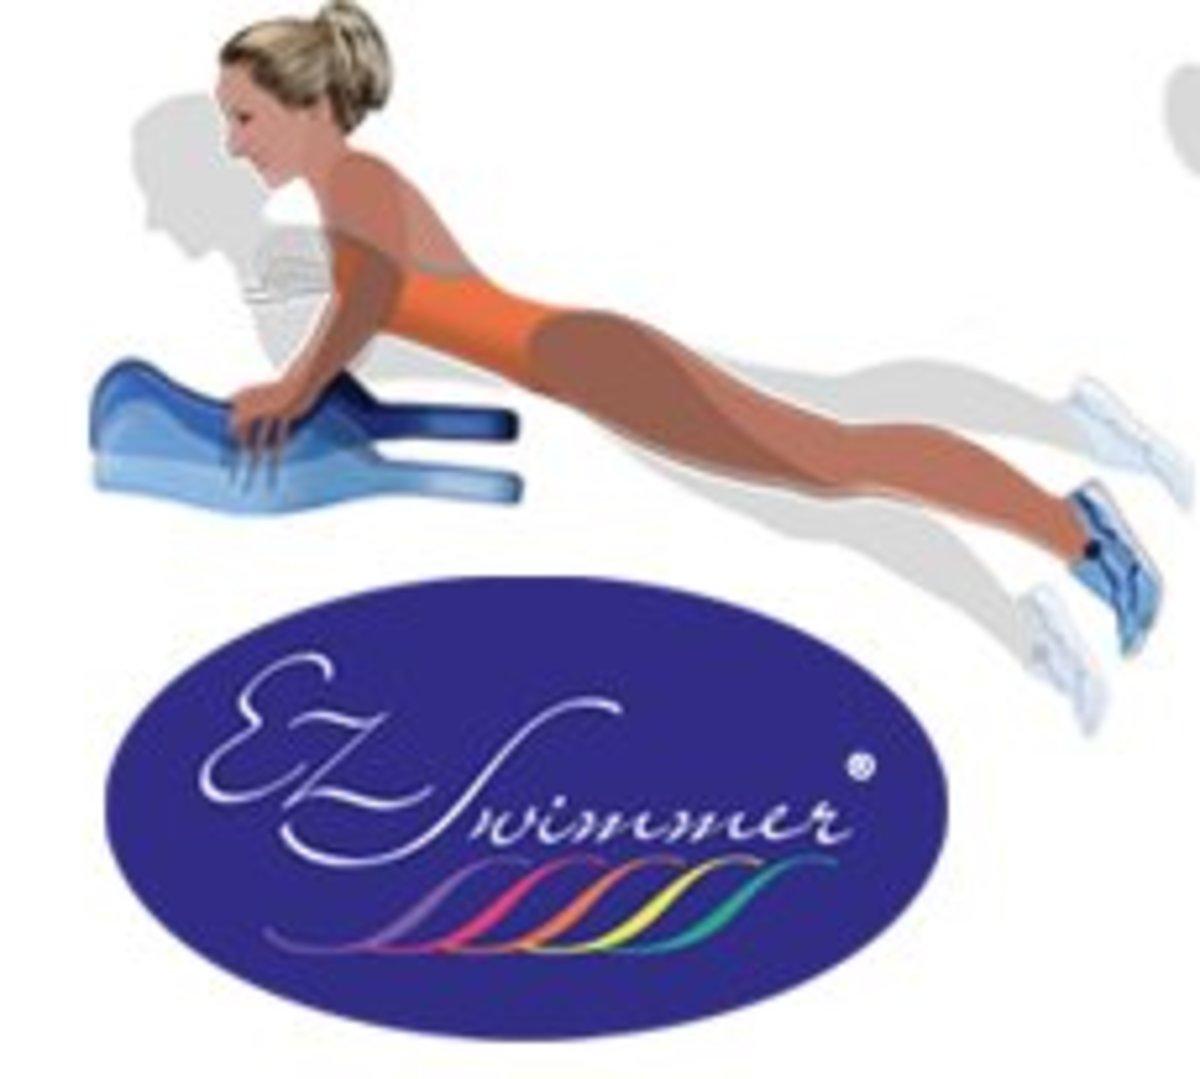 EZ Body Board - EZ Swimmer